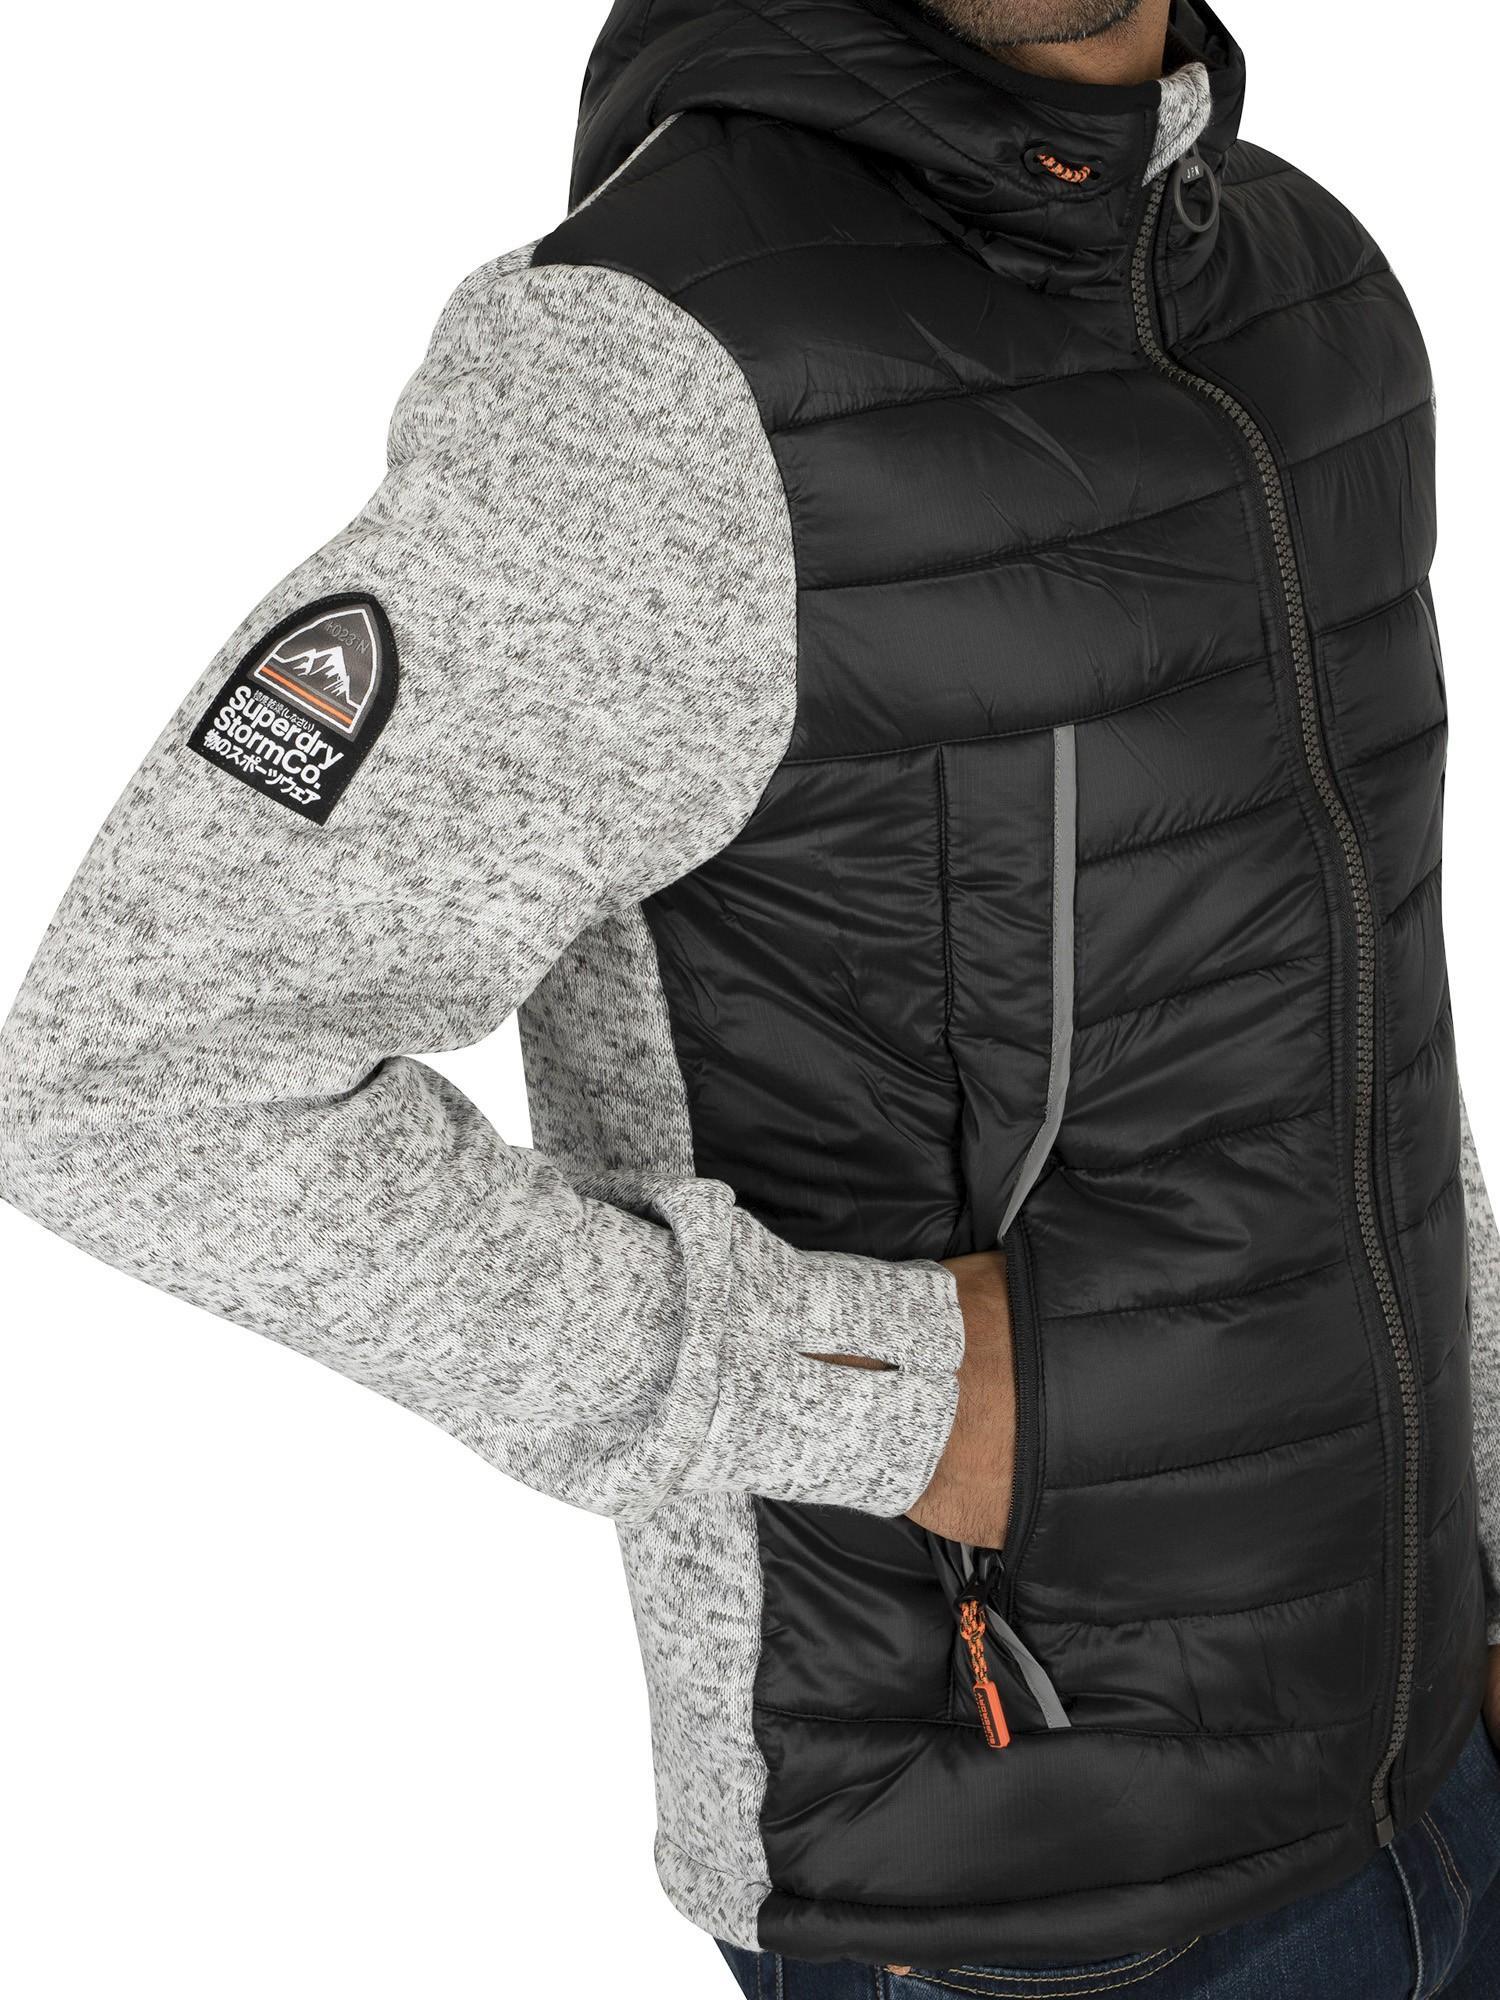 Grey Superdry Men/'s Storm Flash Hybrid Jacket